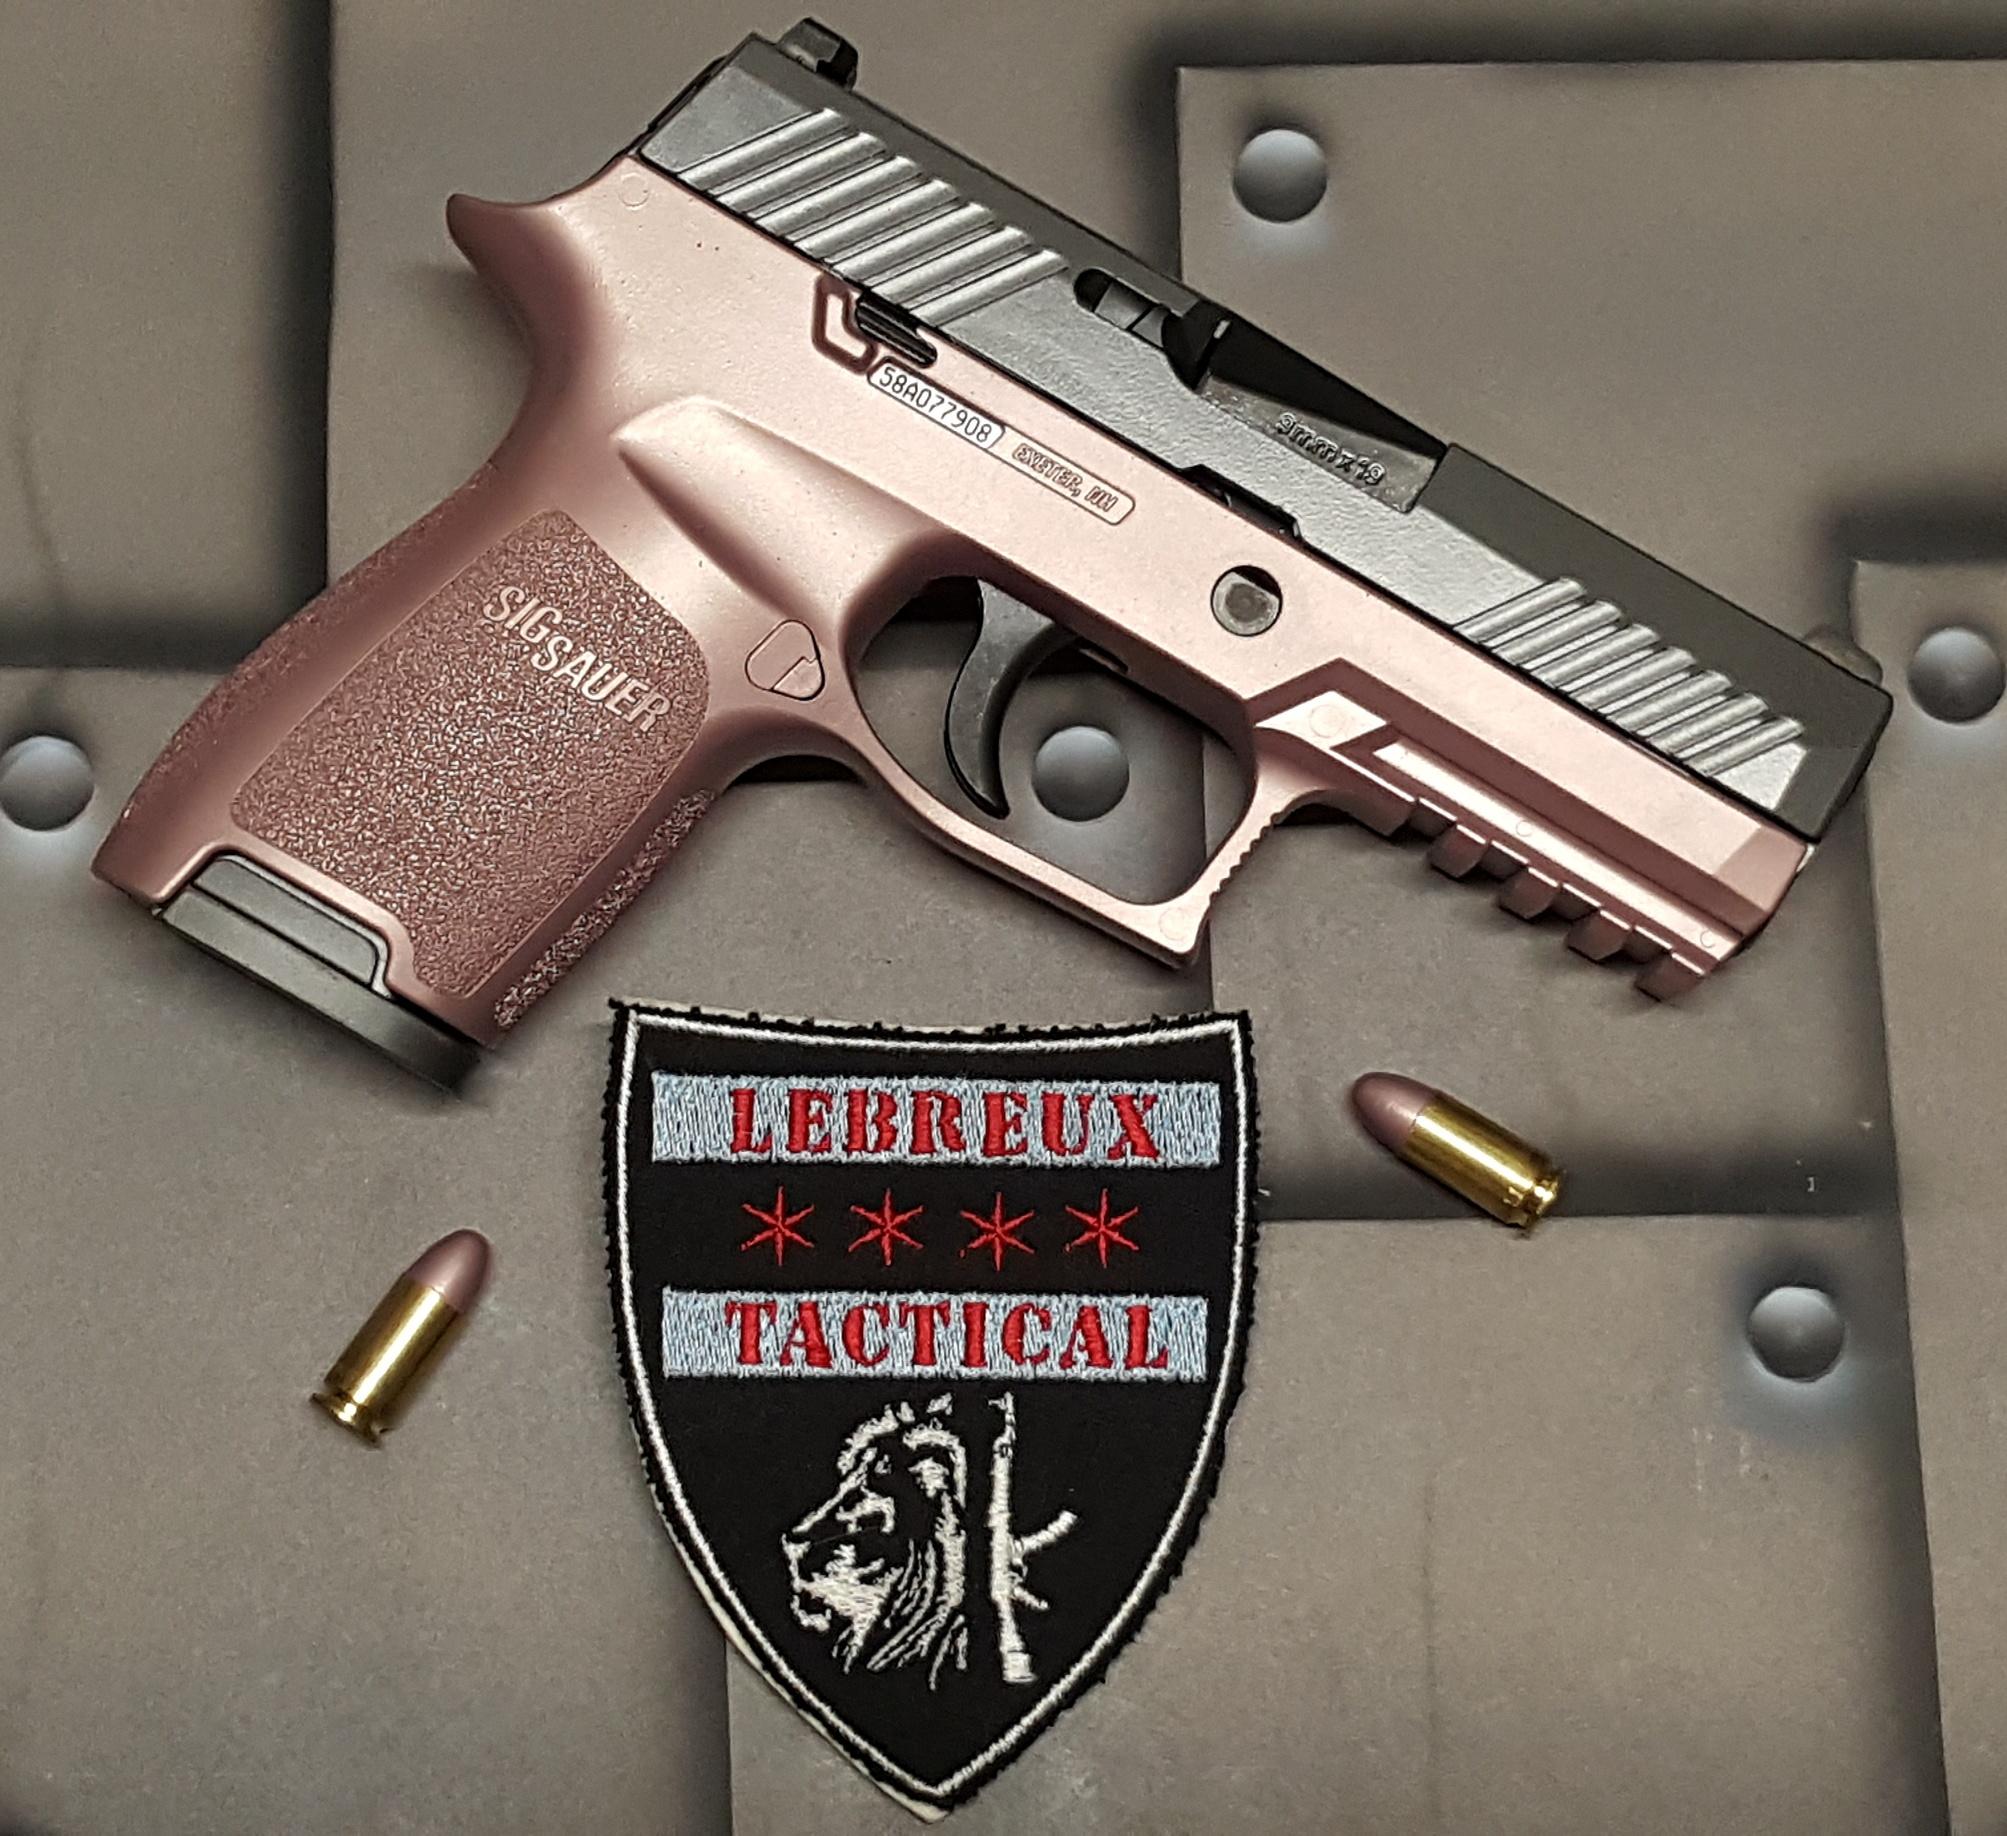 LeBreux Tactical rose gold gun.jpg